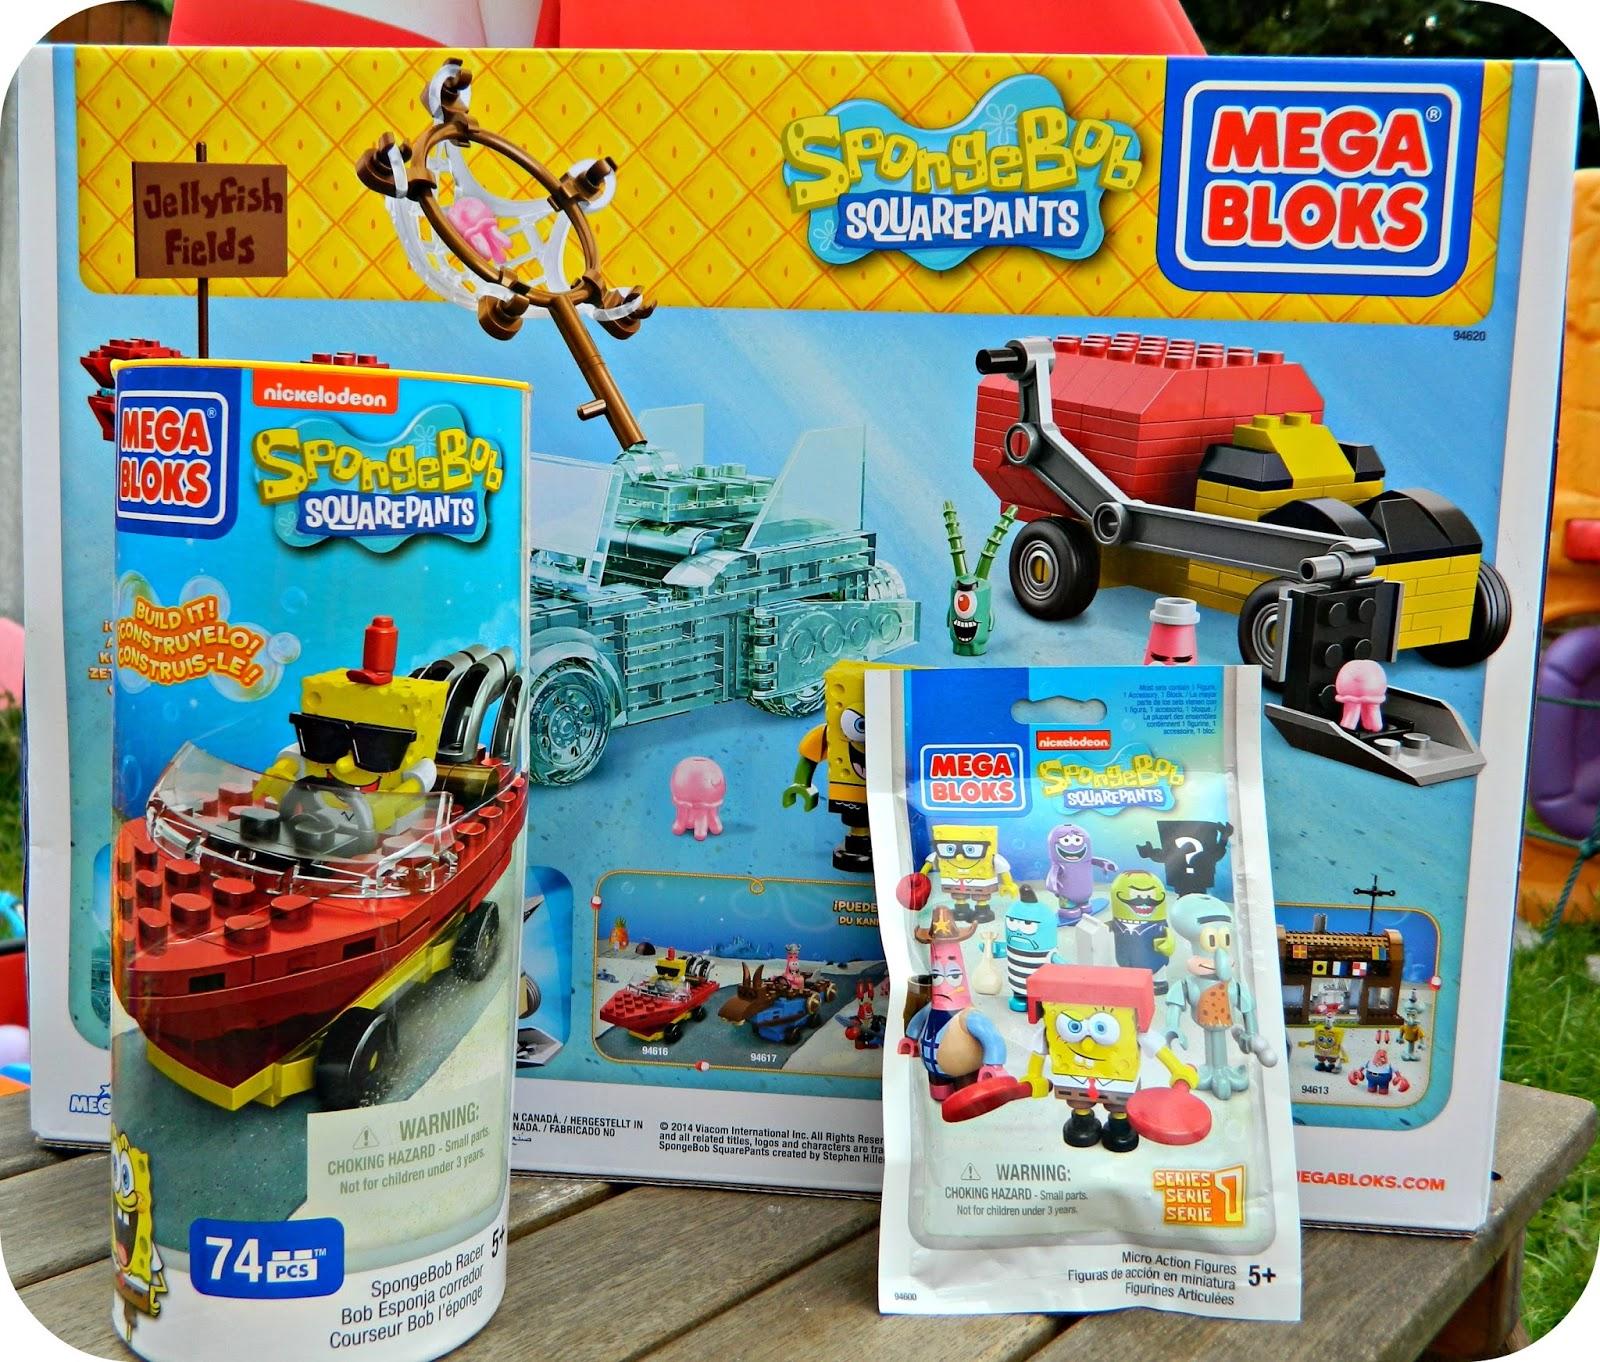 Spongebob Squarepants Mega Bloks